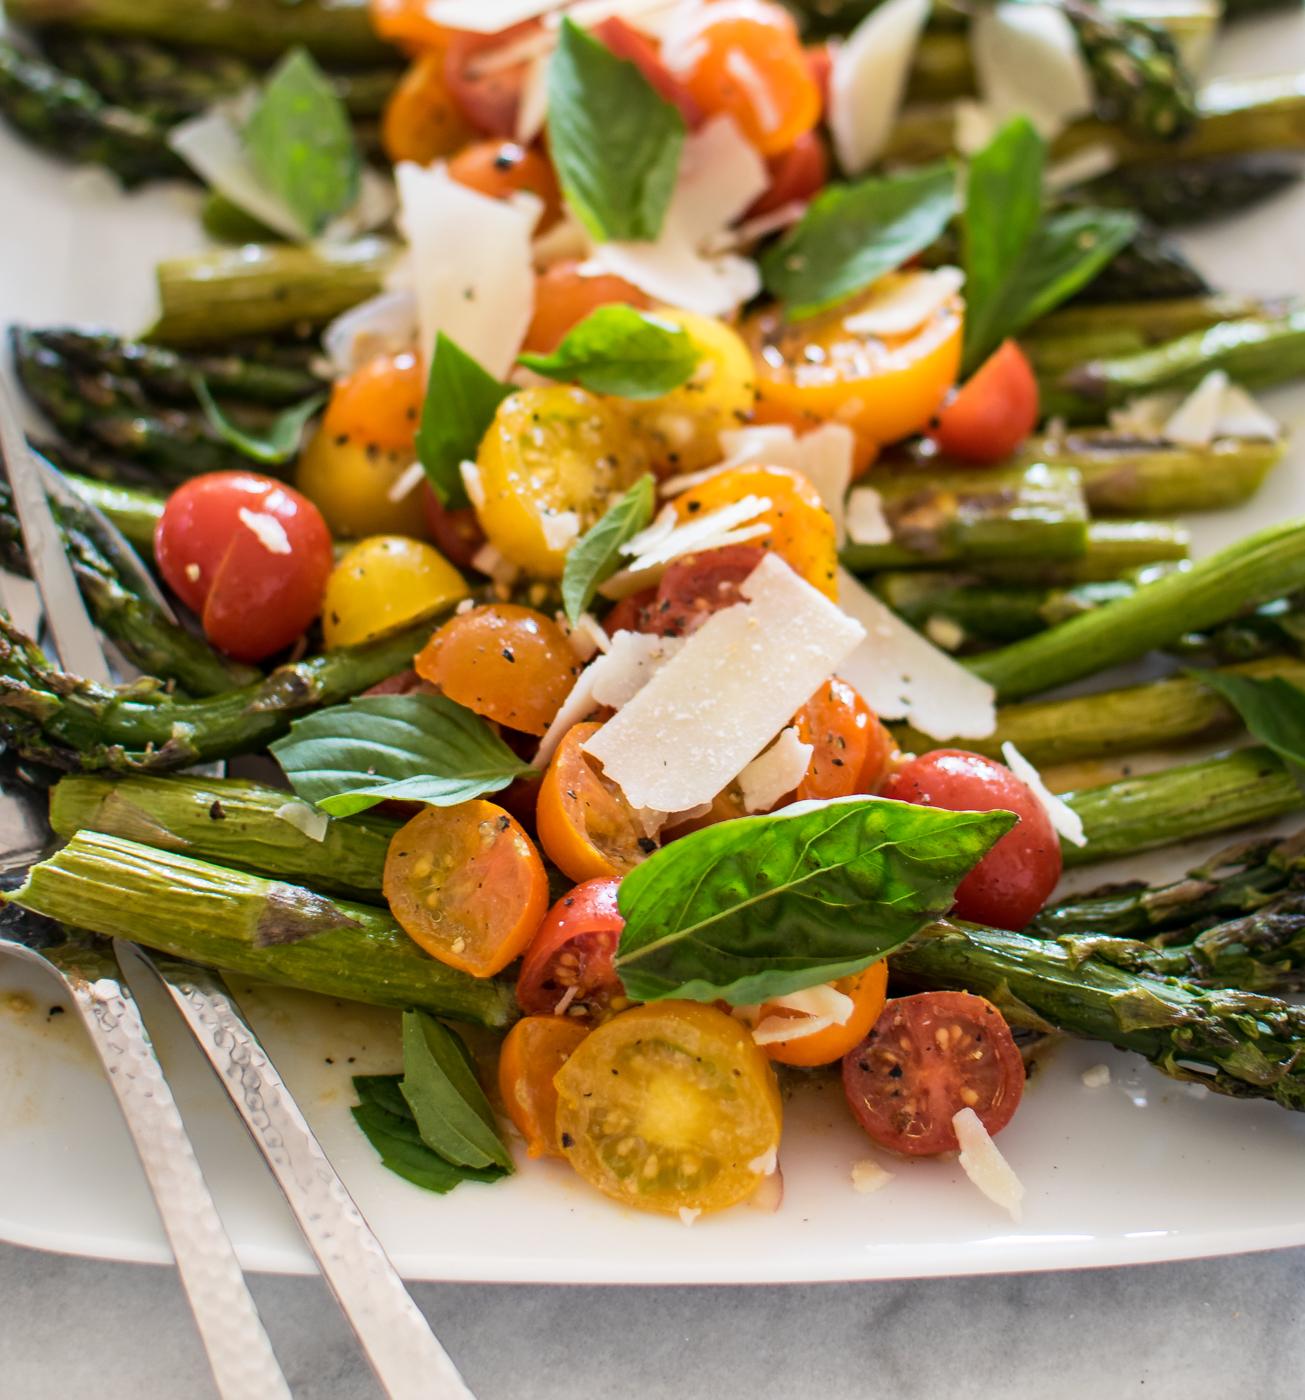 Roasted Asparagus with Marinated Tomato Salad